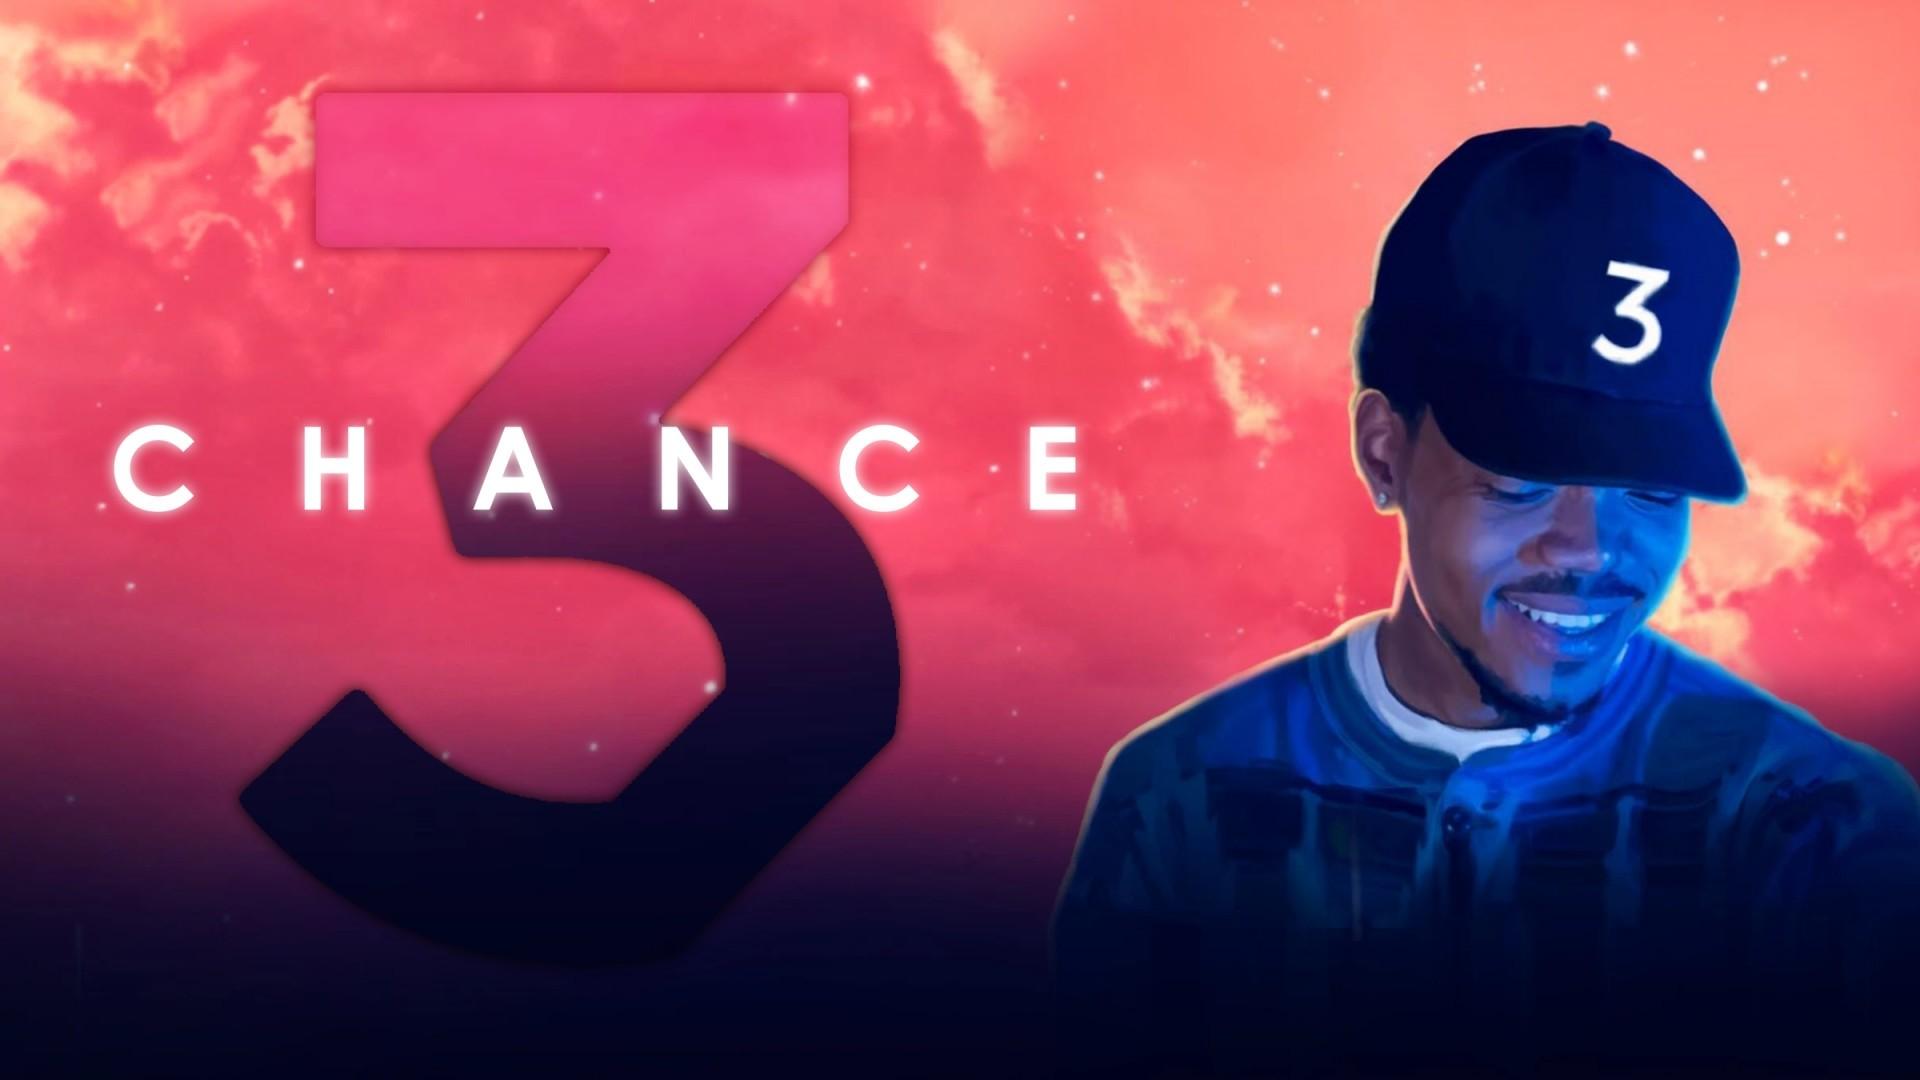 Chance The Rapper HD Wallpaper